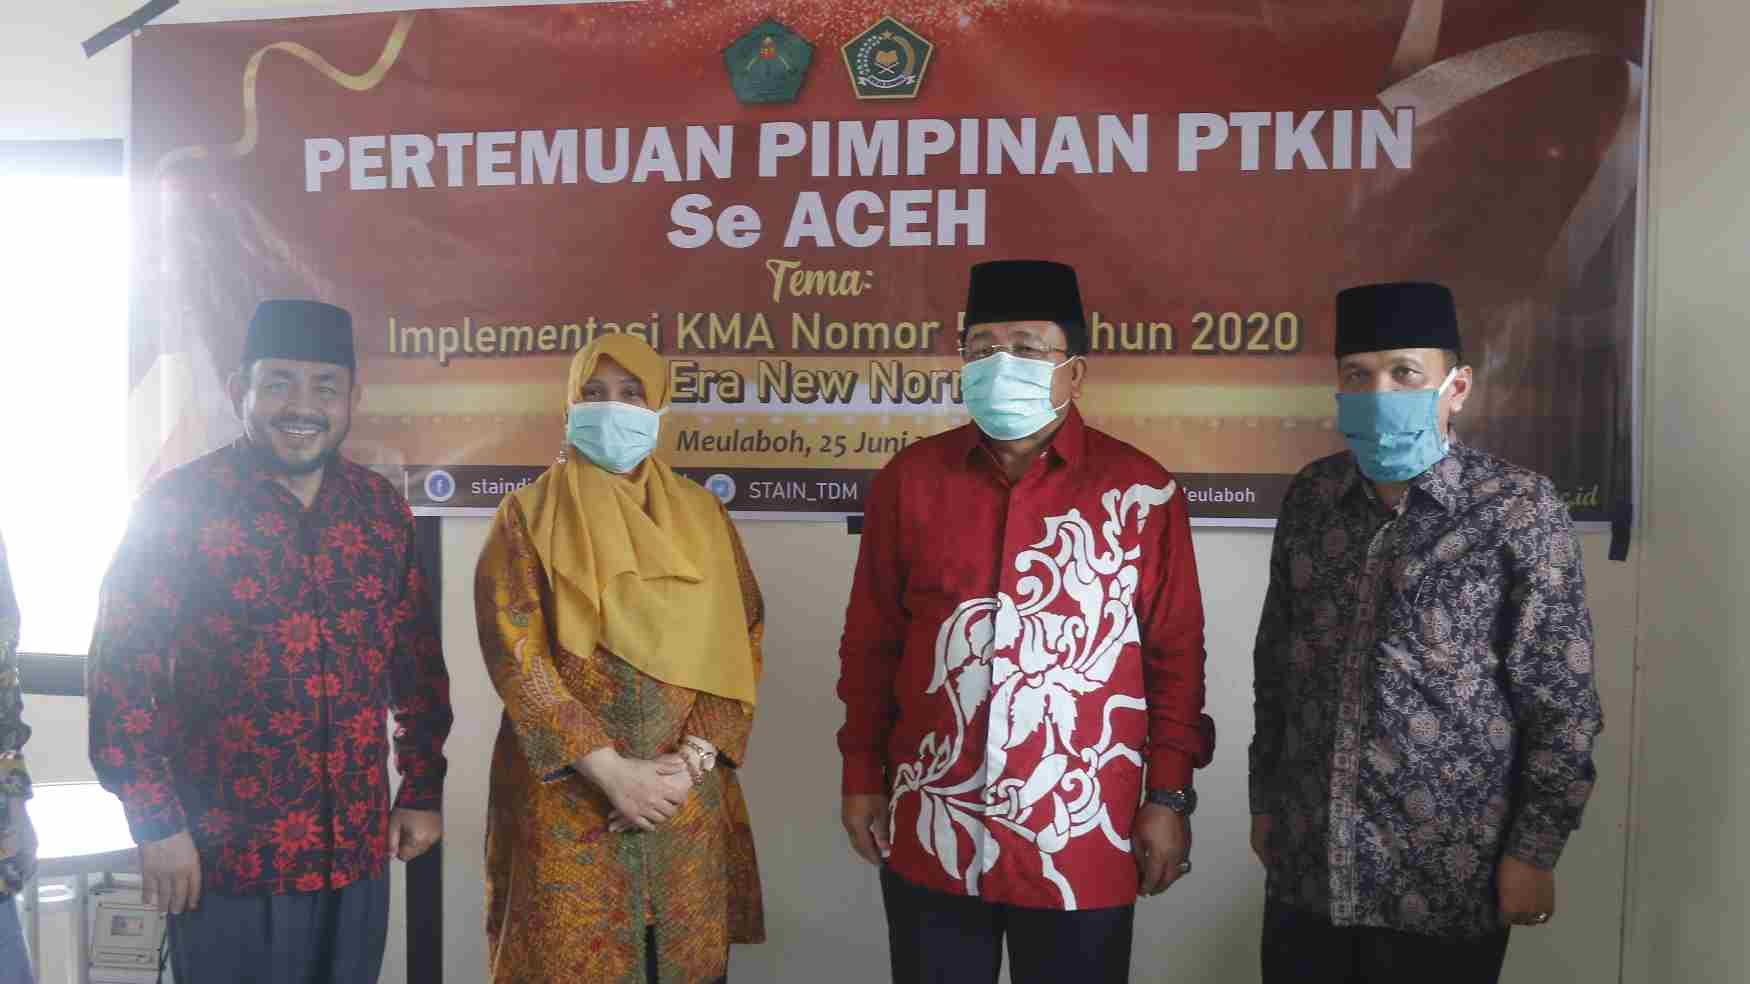 Rektor Aceh